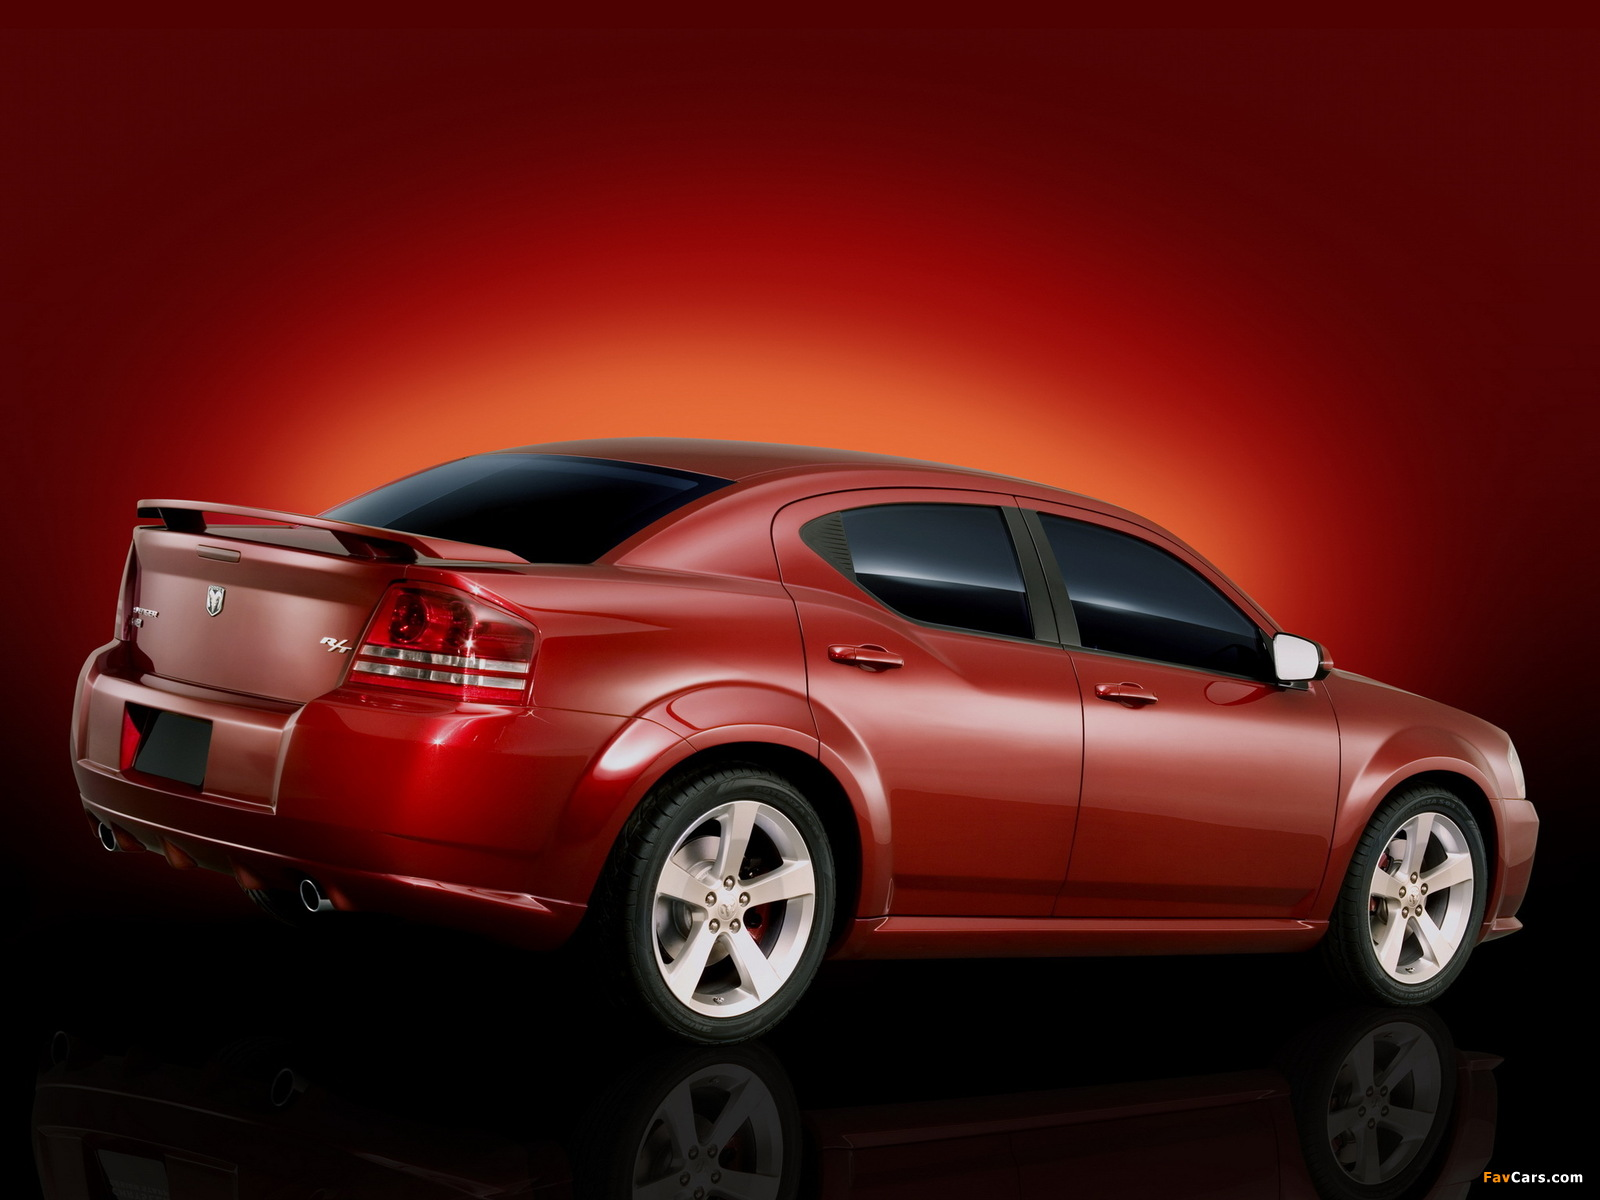 Dodge Avenger Concept 2006 wallpapers (1600 x 1200)